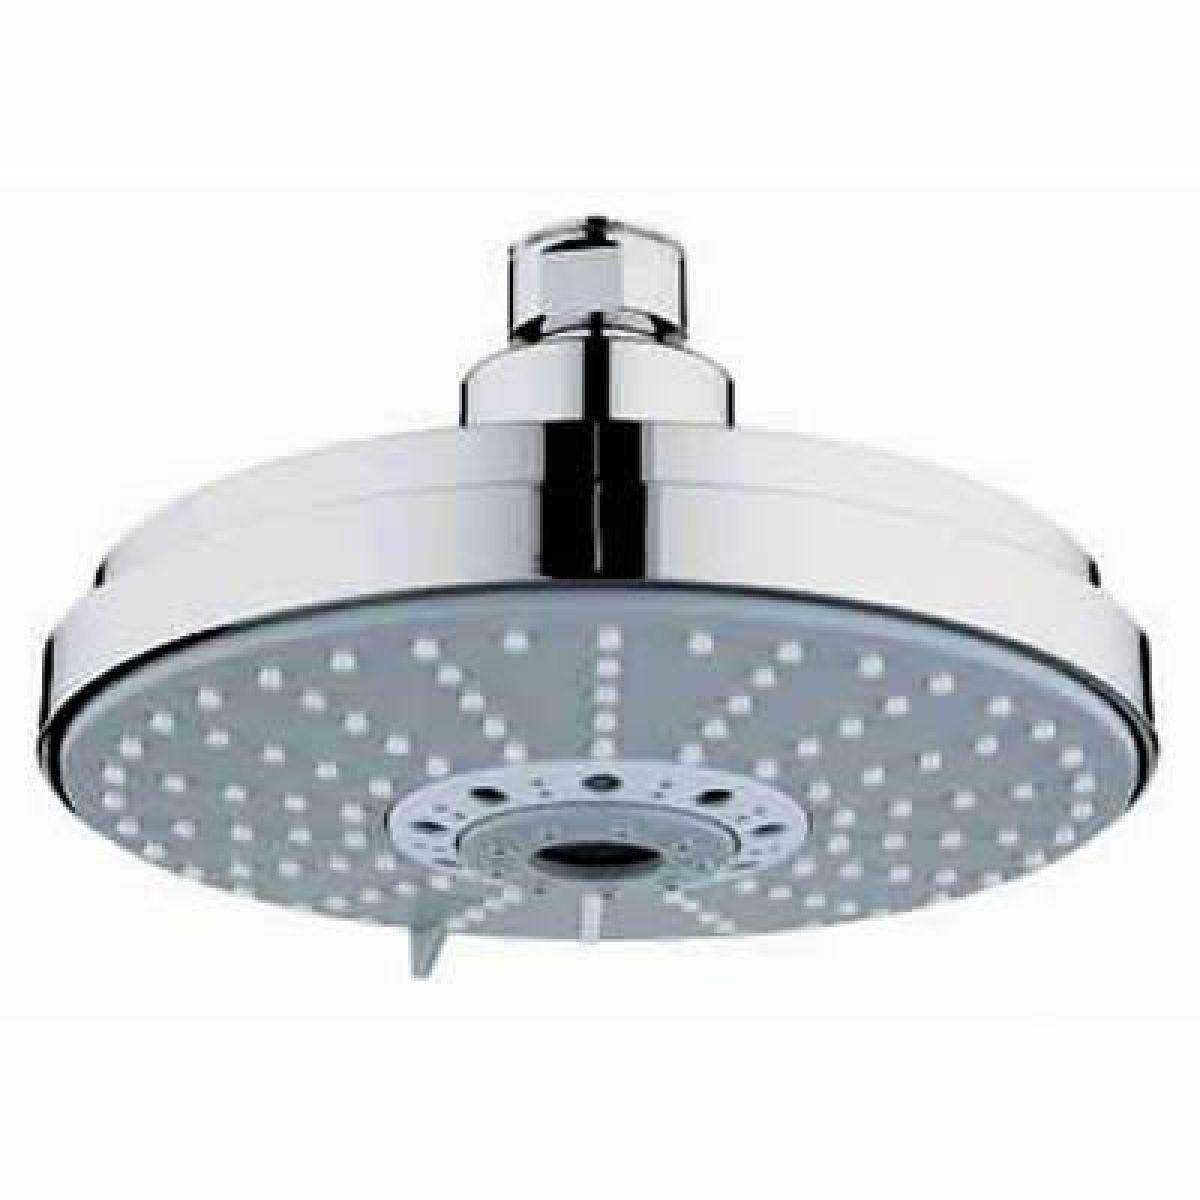 grohe rainshower 162mm cosmopolitan shower head uk bathrooms. Black Bedroom Furniture Sets. Home Design Ideas